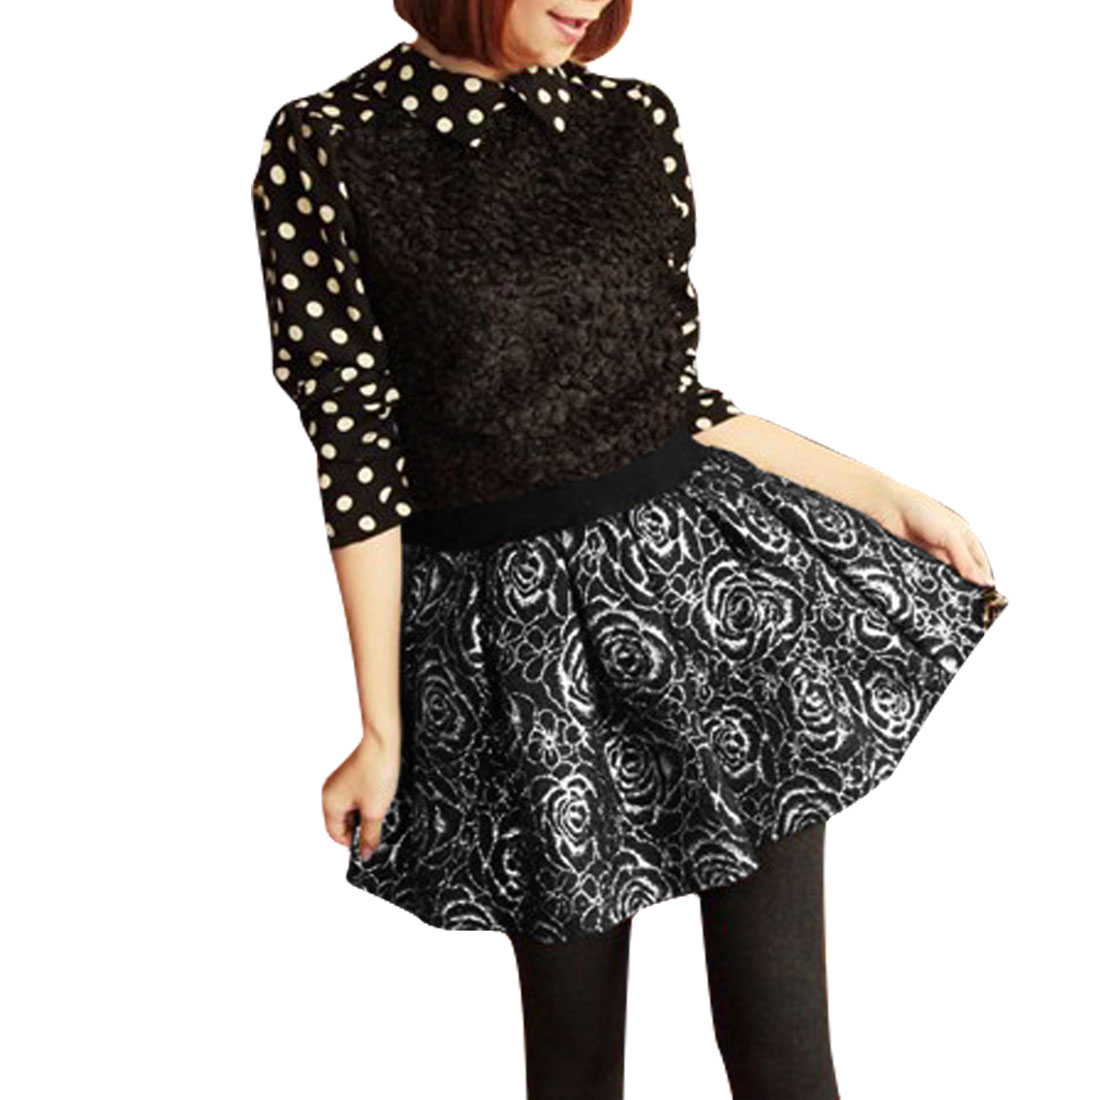 Women High Waist A-line Floral Prints Mini Chic Skirt Silver Tone XS